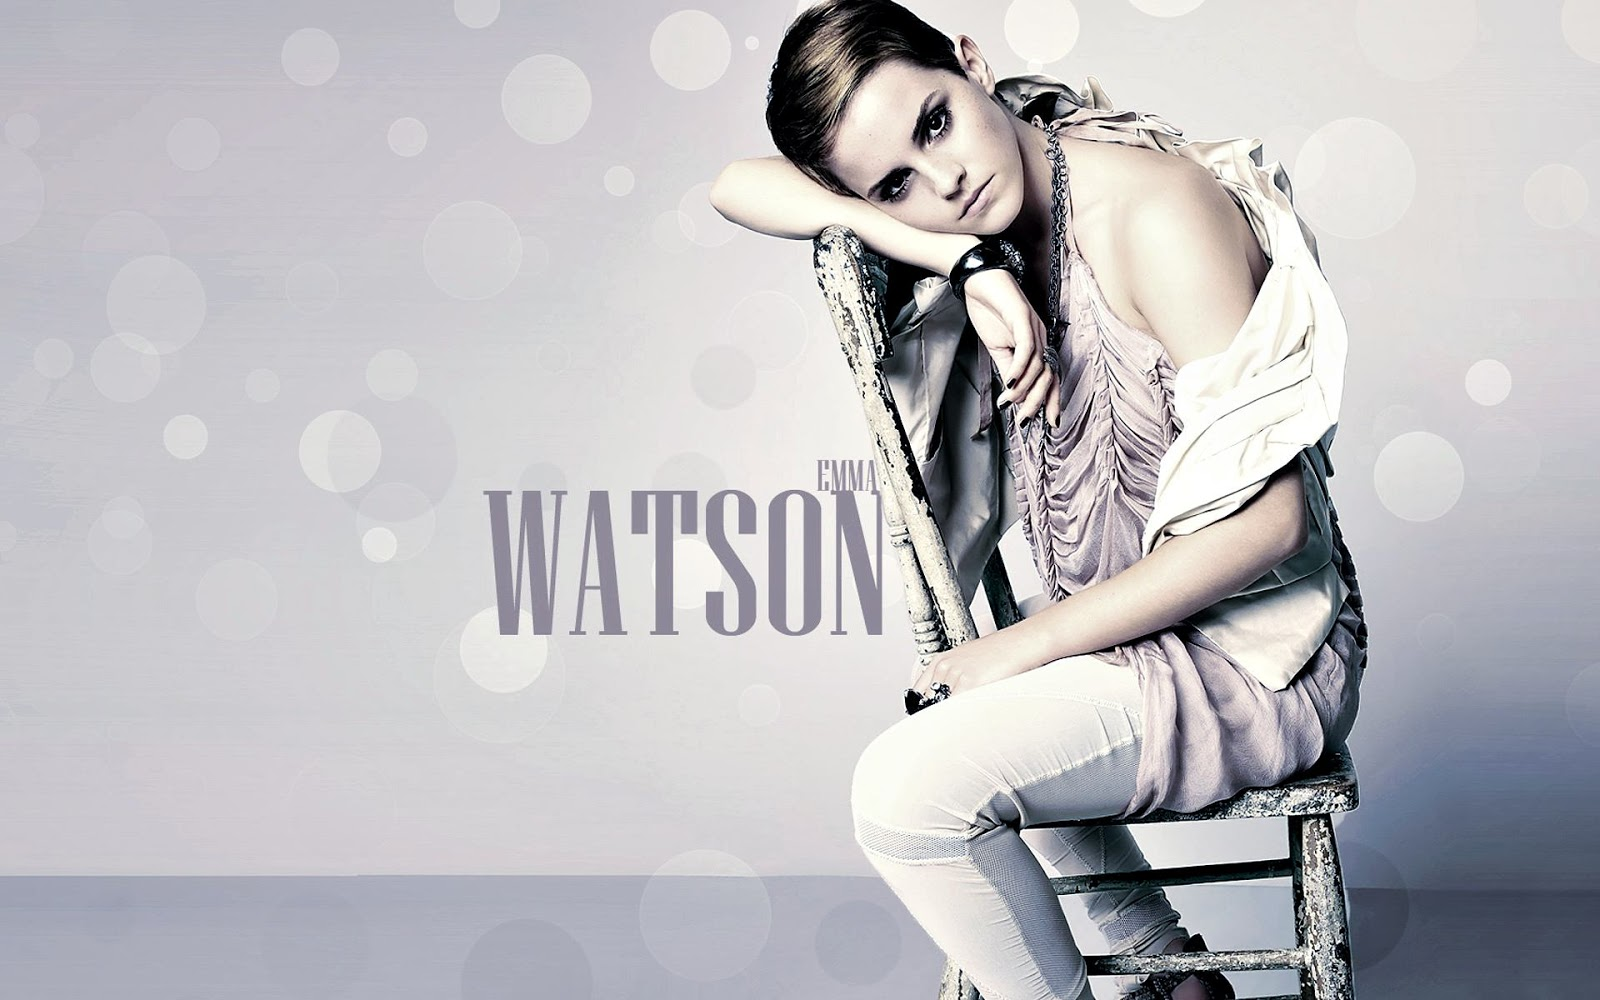 Wallpaper Autumn Emma Watson Hd Wallpapers Free Download-5577